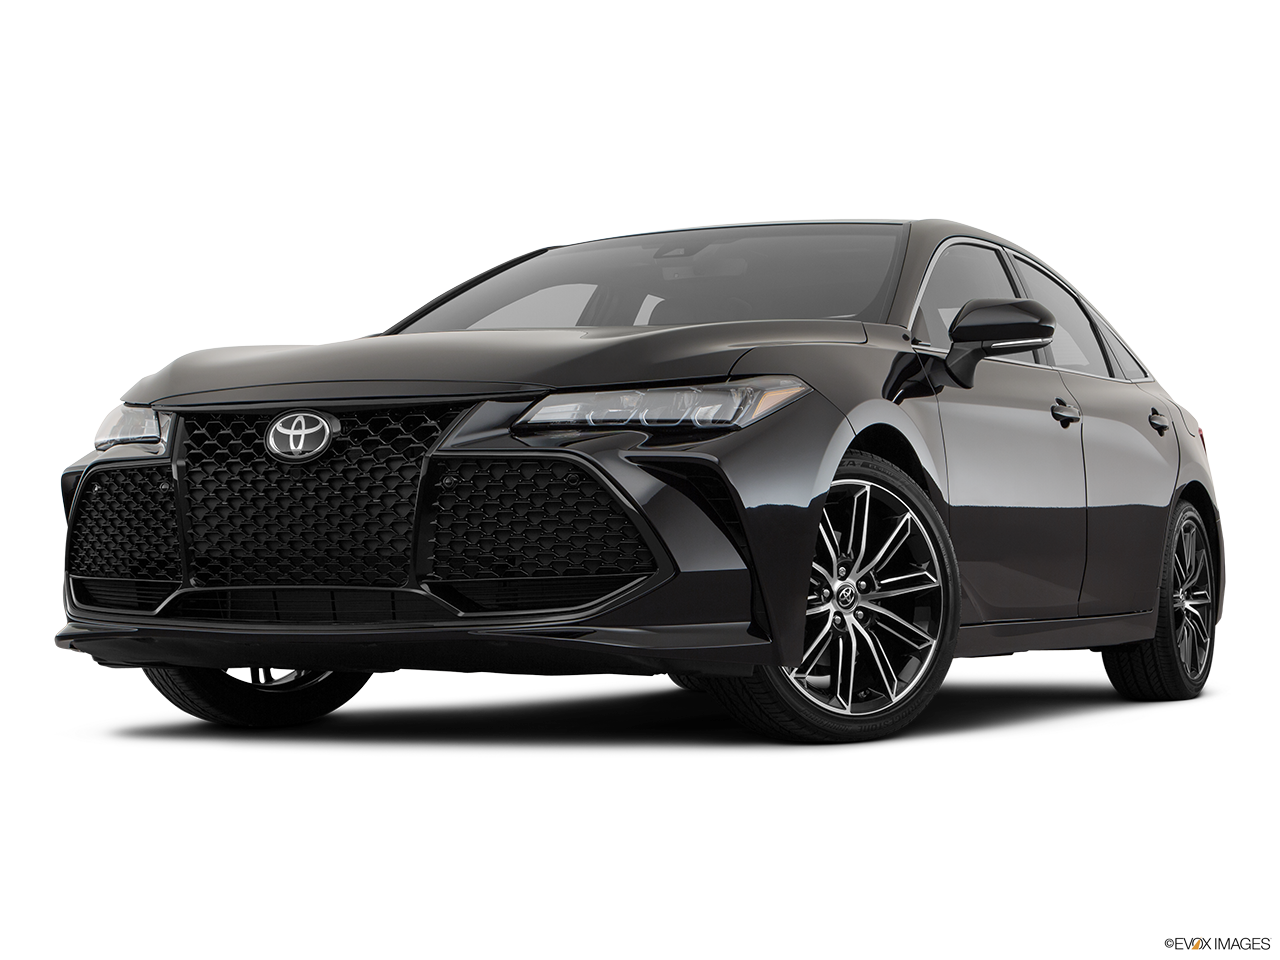 2019 Toyota Avalon photo